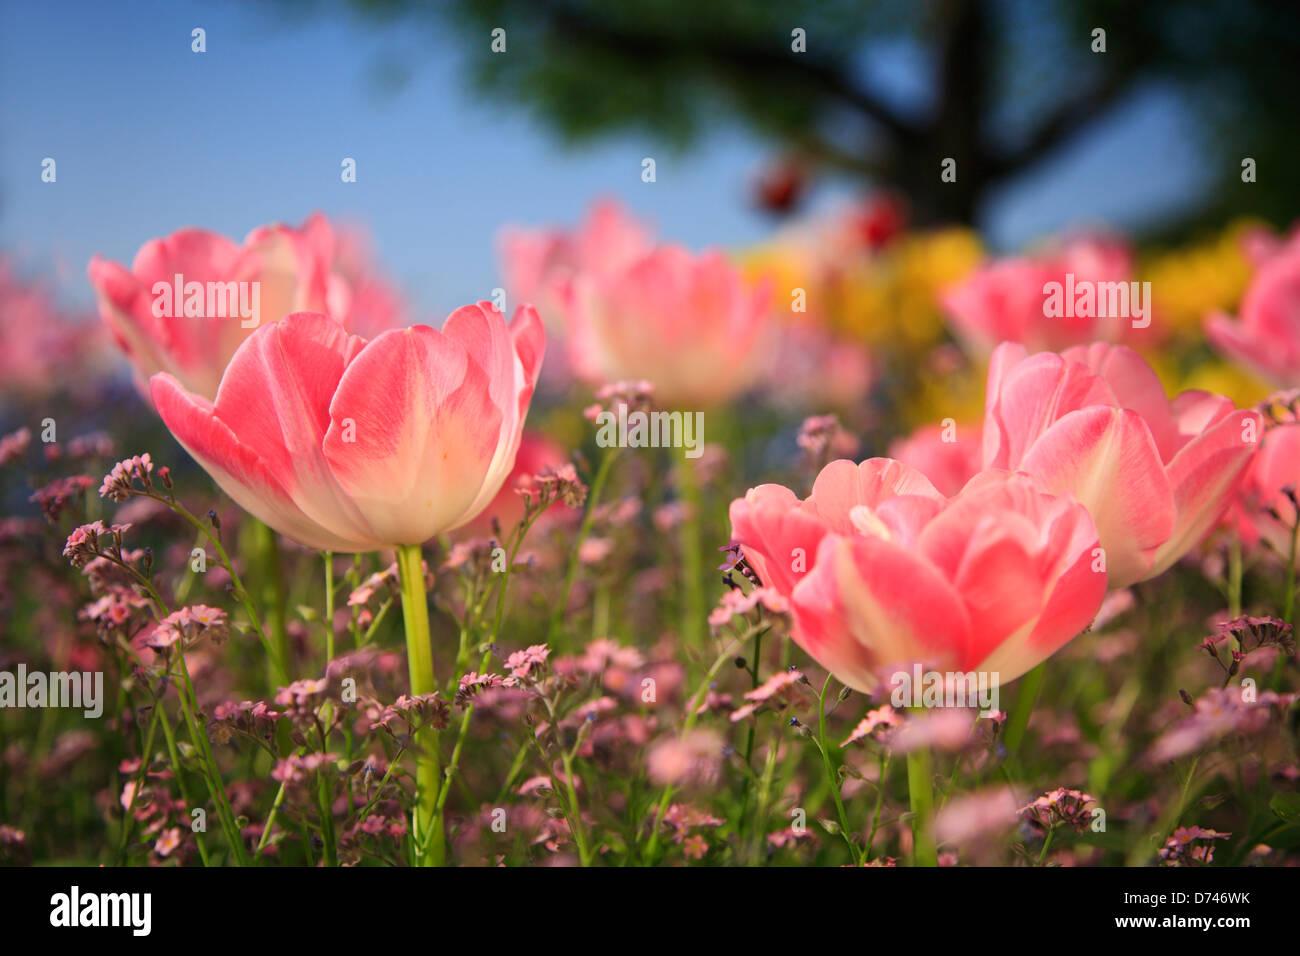 Tulips garden - Stock Image